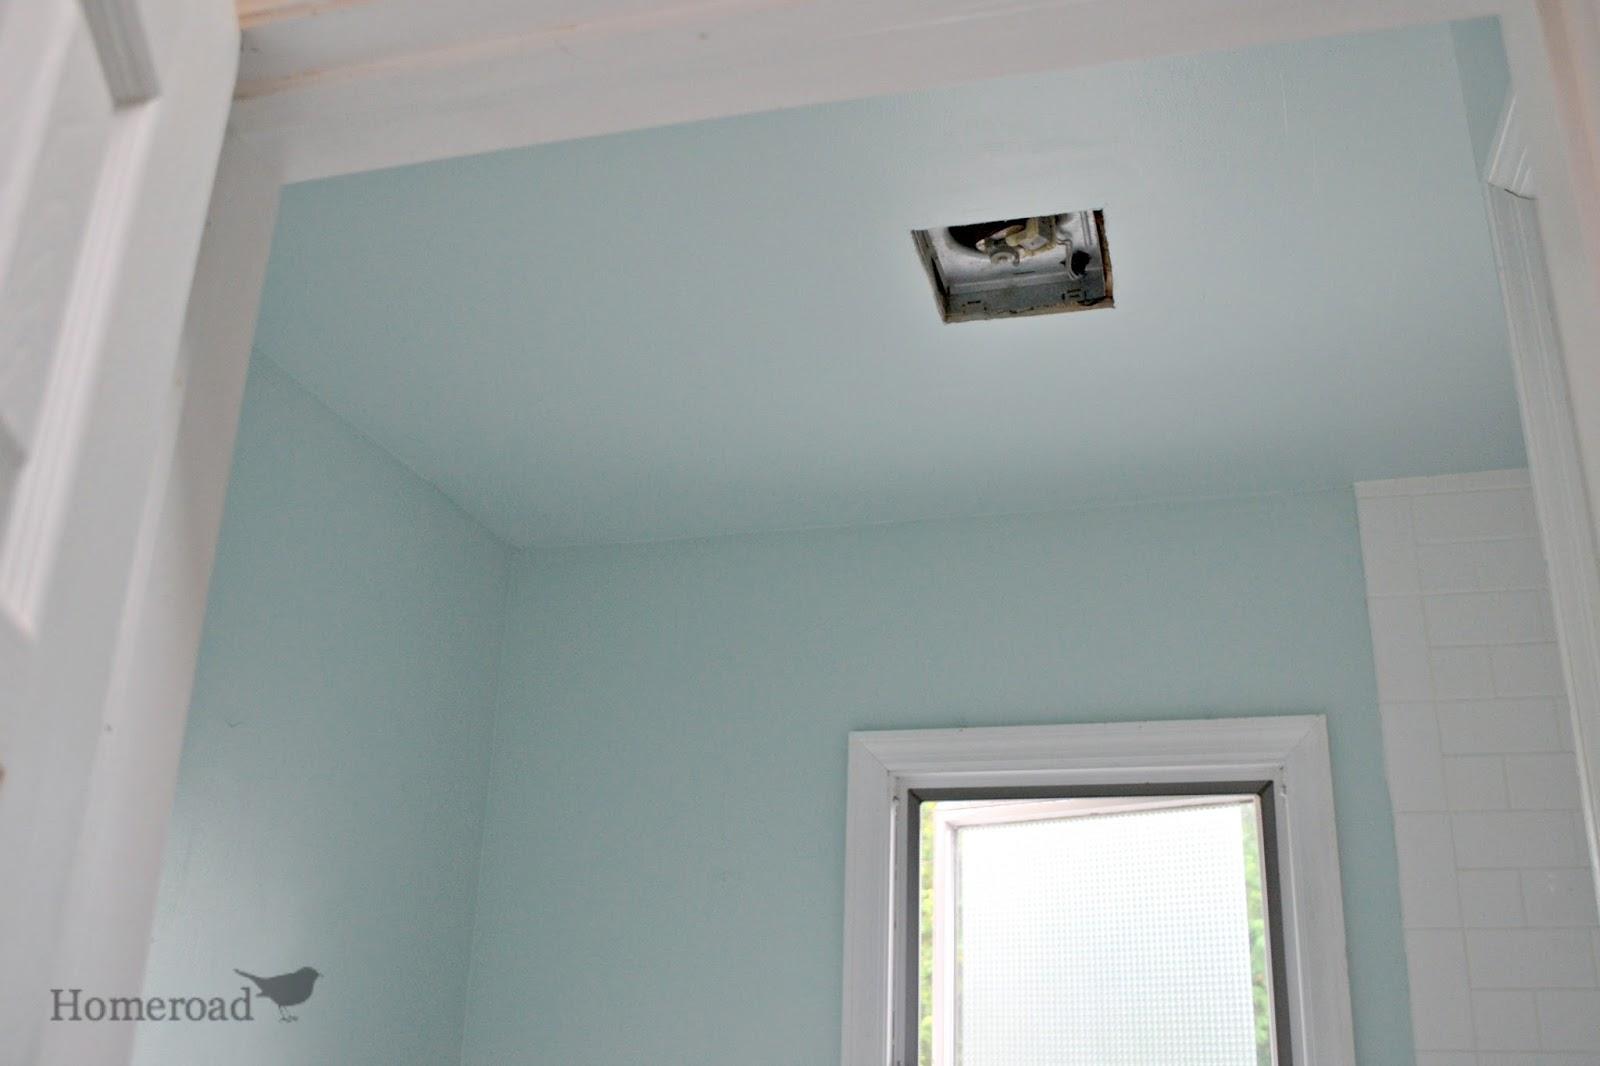 painting the master bathroom homeroad. Black Bedroom Furniture Sets. Home Design Ideas